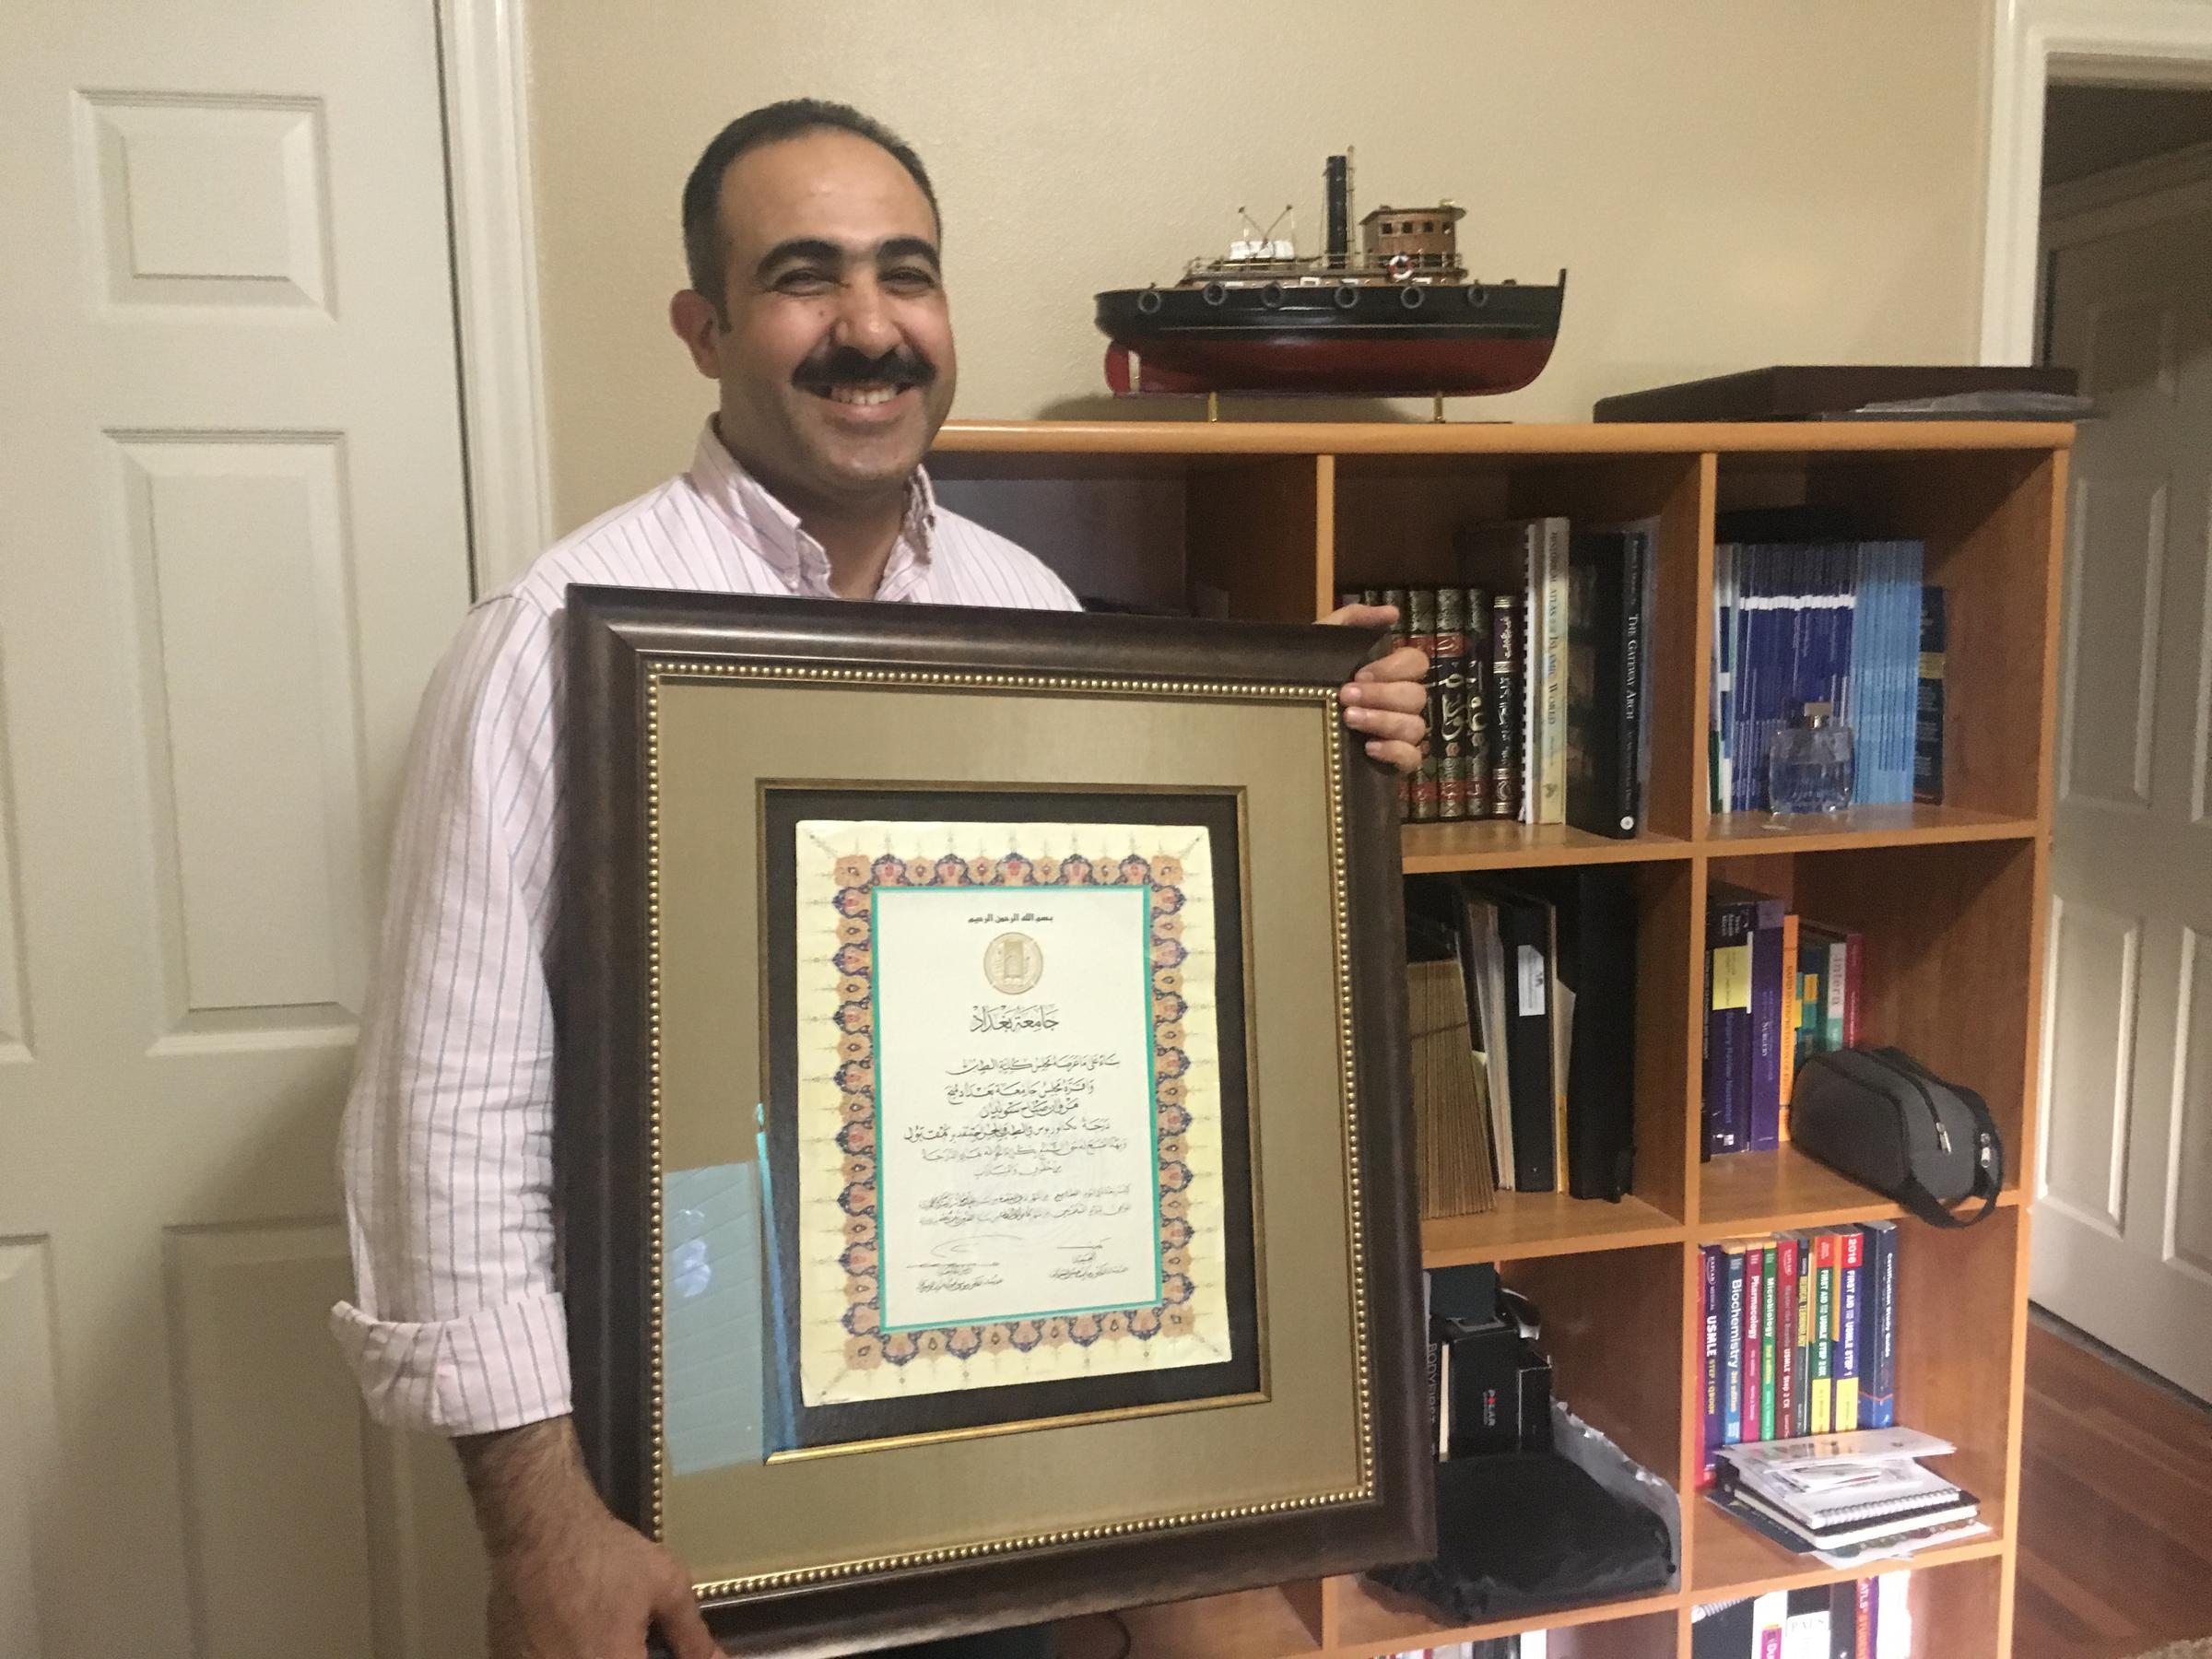 Despite Doctor Shortage, Refugee Physicians Face Big Hurdles To ...